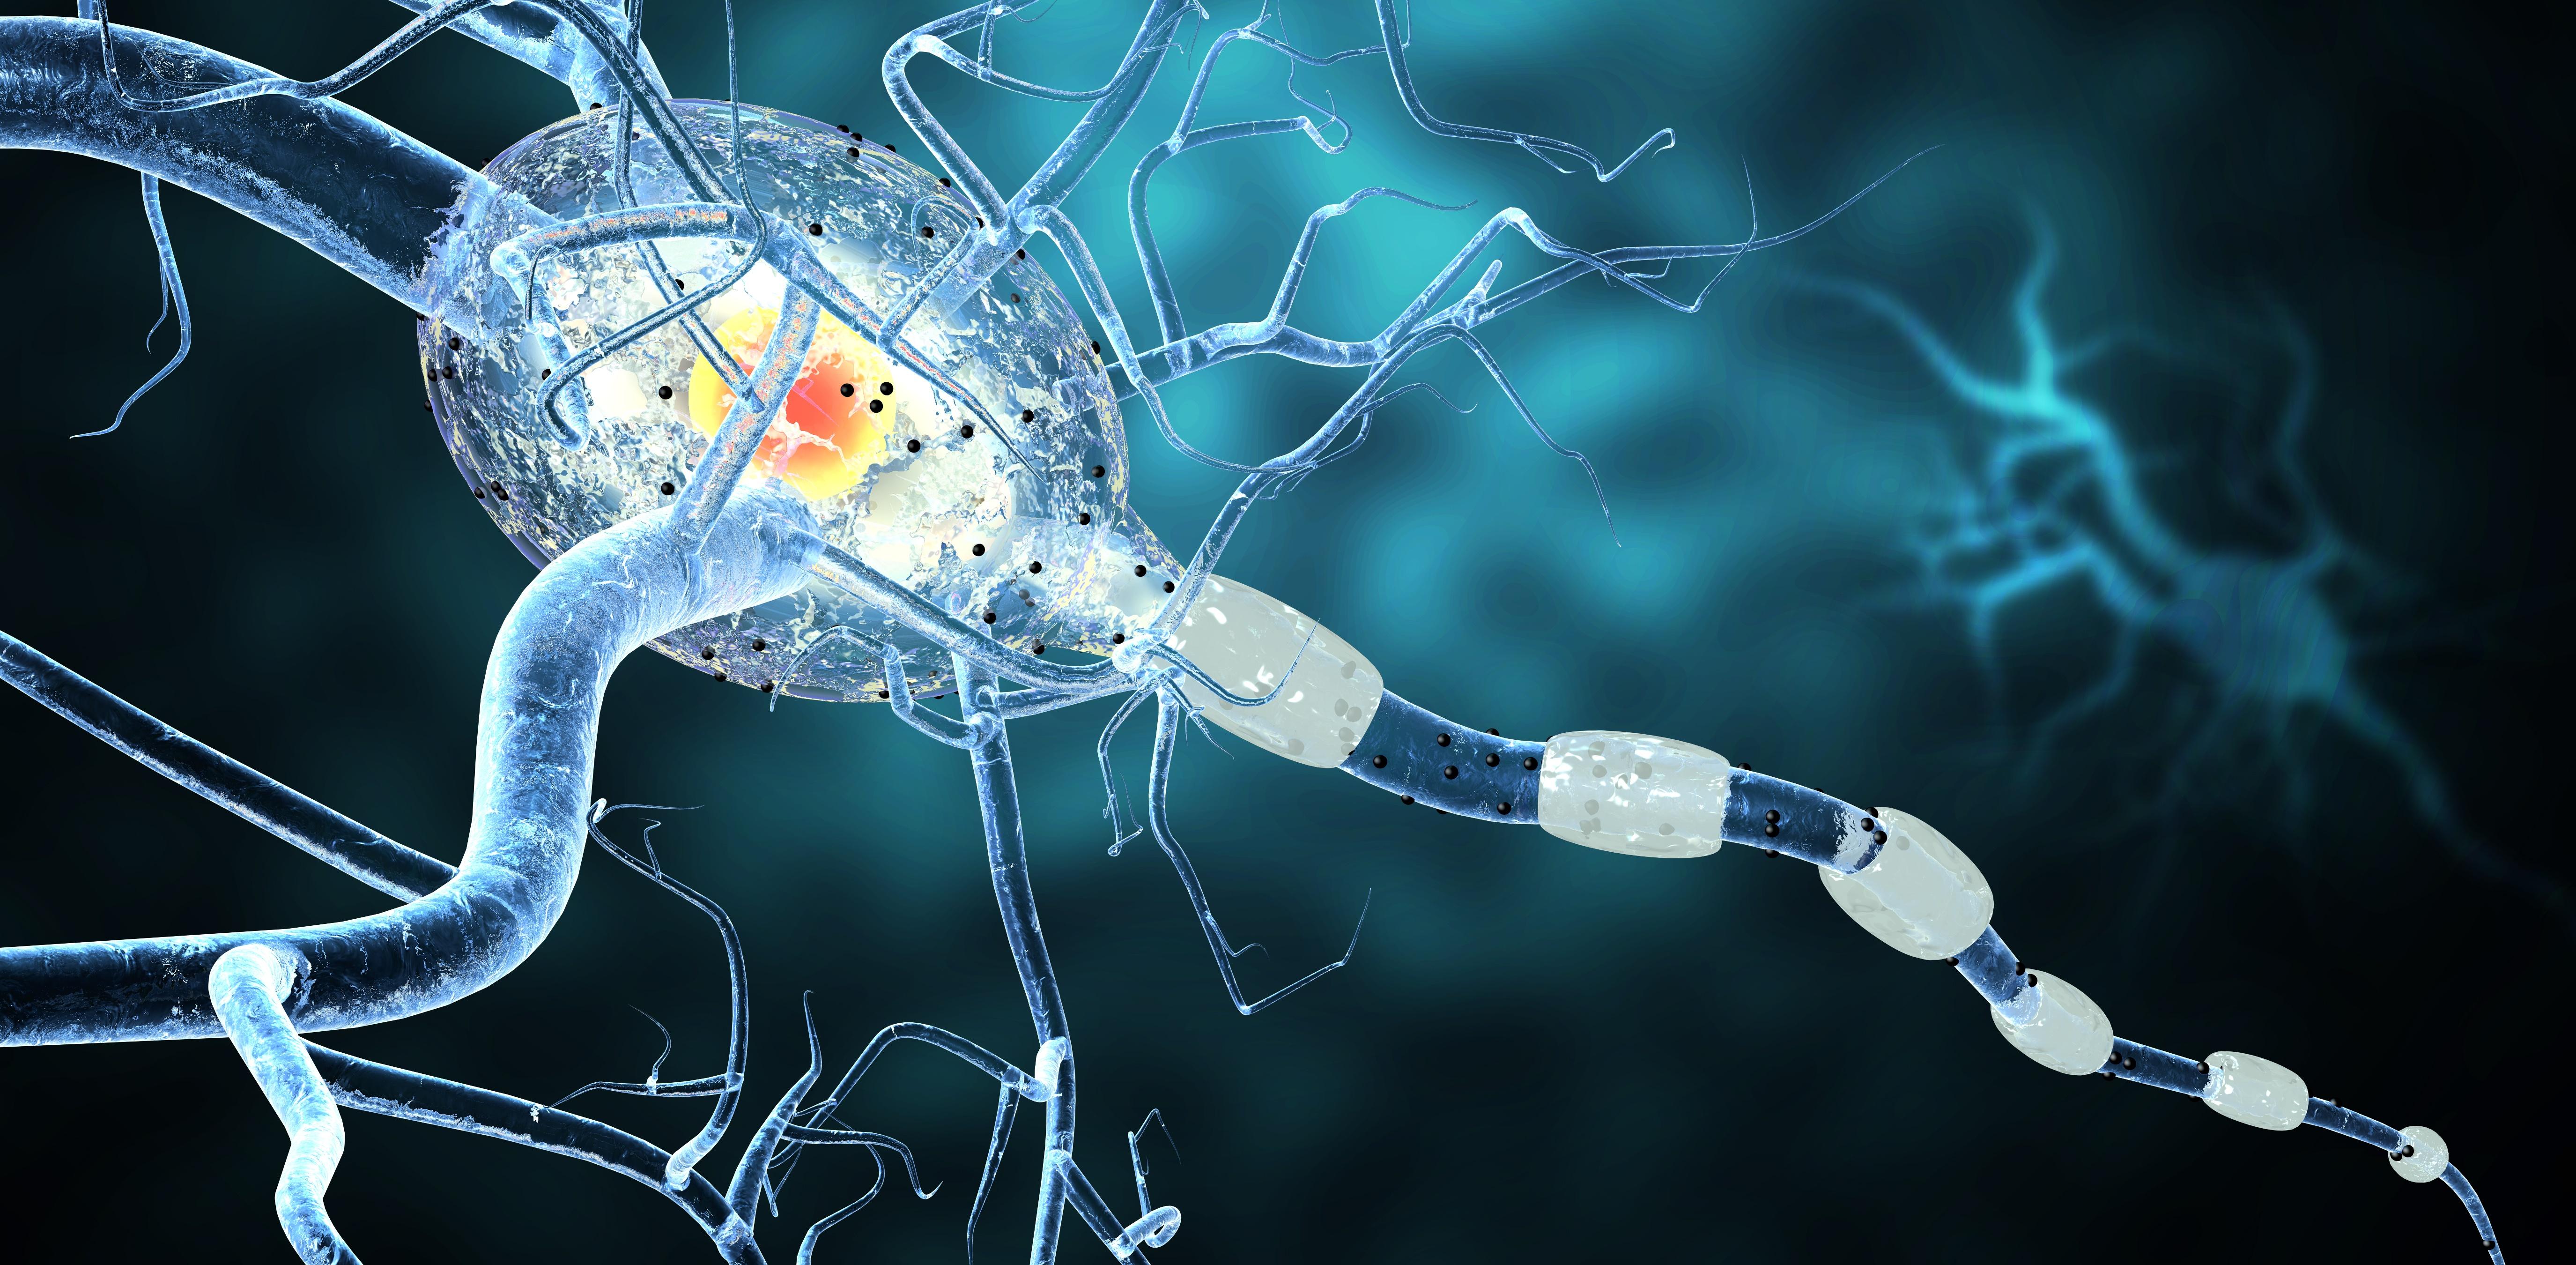 Multiple-Sclerosis-Myelin-EAE-Batch-Release-Testing-GLP-Copaxone_Generics.jpg